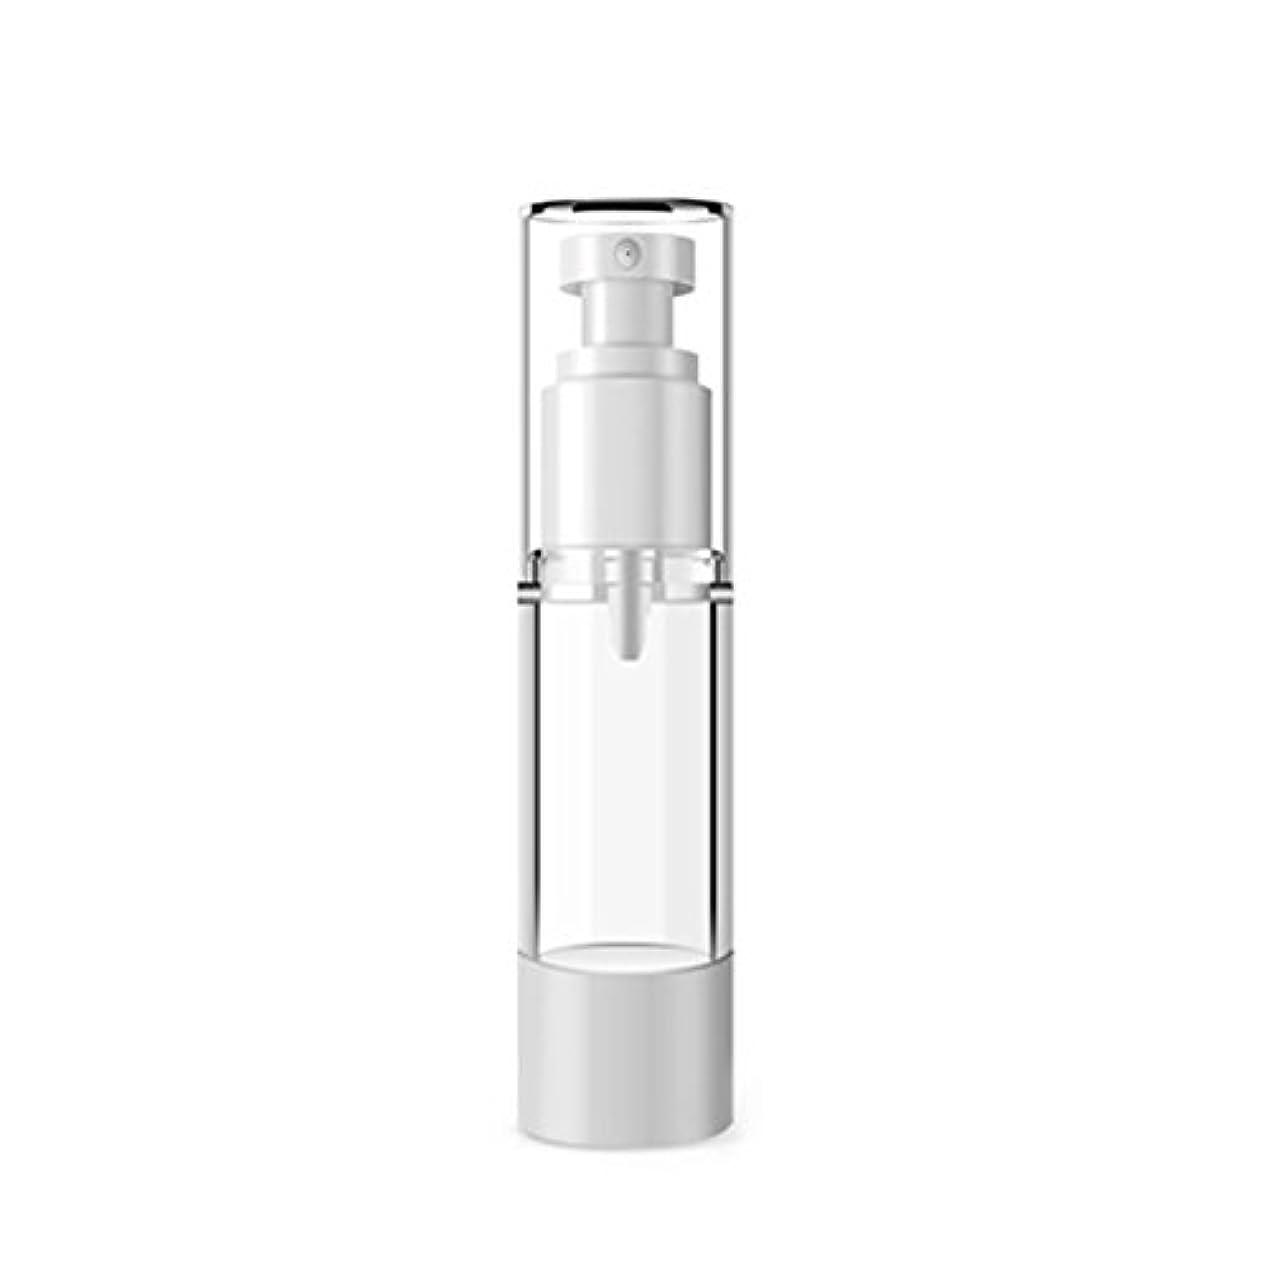 Vi.yo 小分けボトル スプレーボトル 押し式詰替用ボトル コスメ用詰替え容器 携帯便利 出張 旅行用品 スタイル2 3本セット 100ml